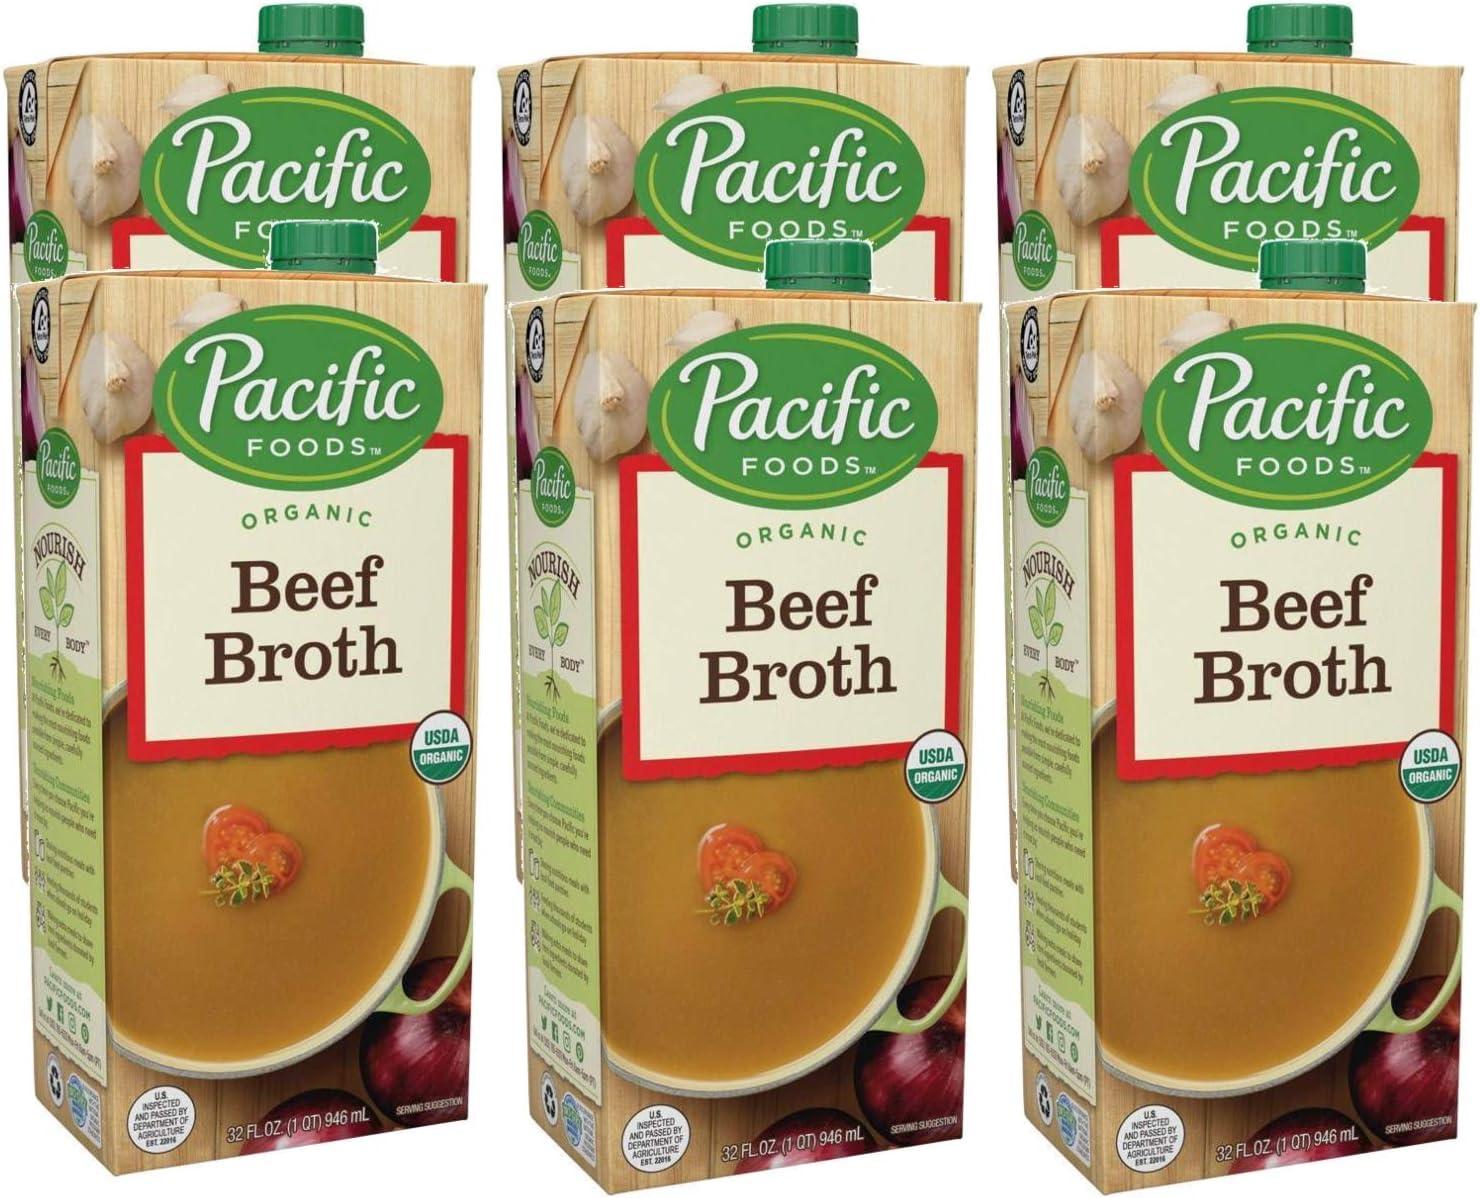 Pacific Foods Organic Gluten-Free Max 75% OFF Beef Washington Mall Broth Count - fl 6 oz 32